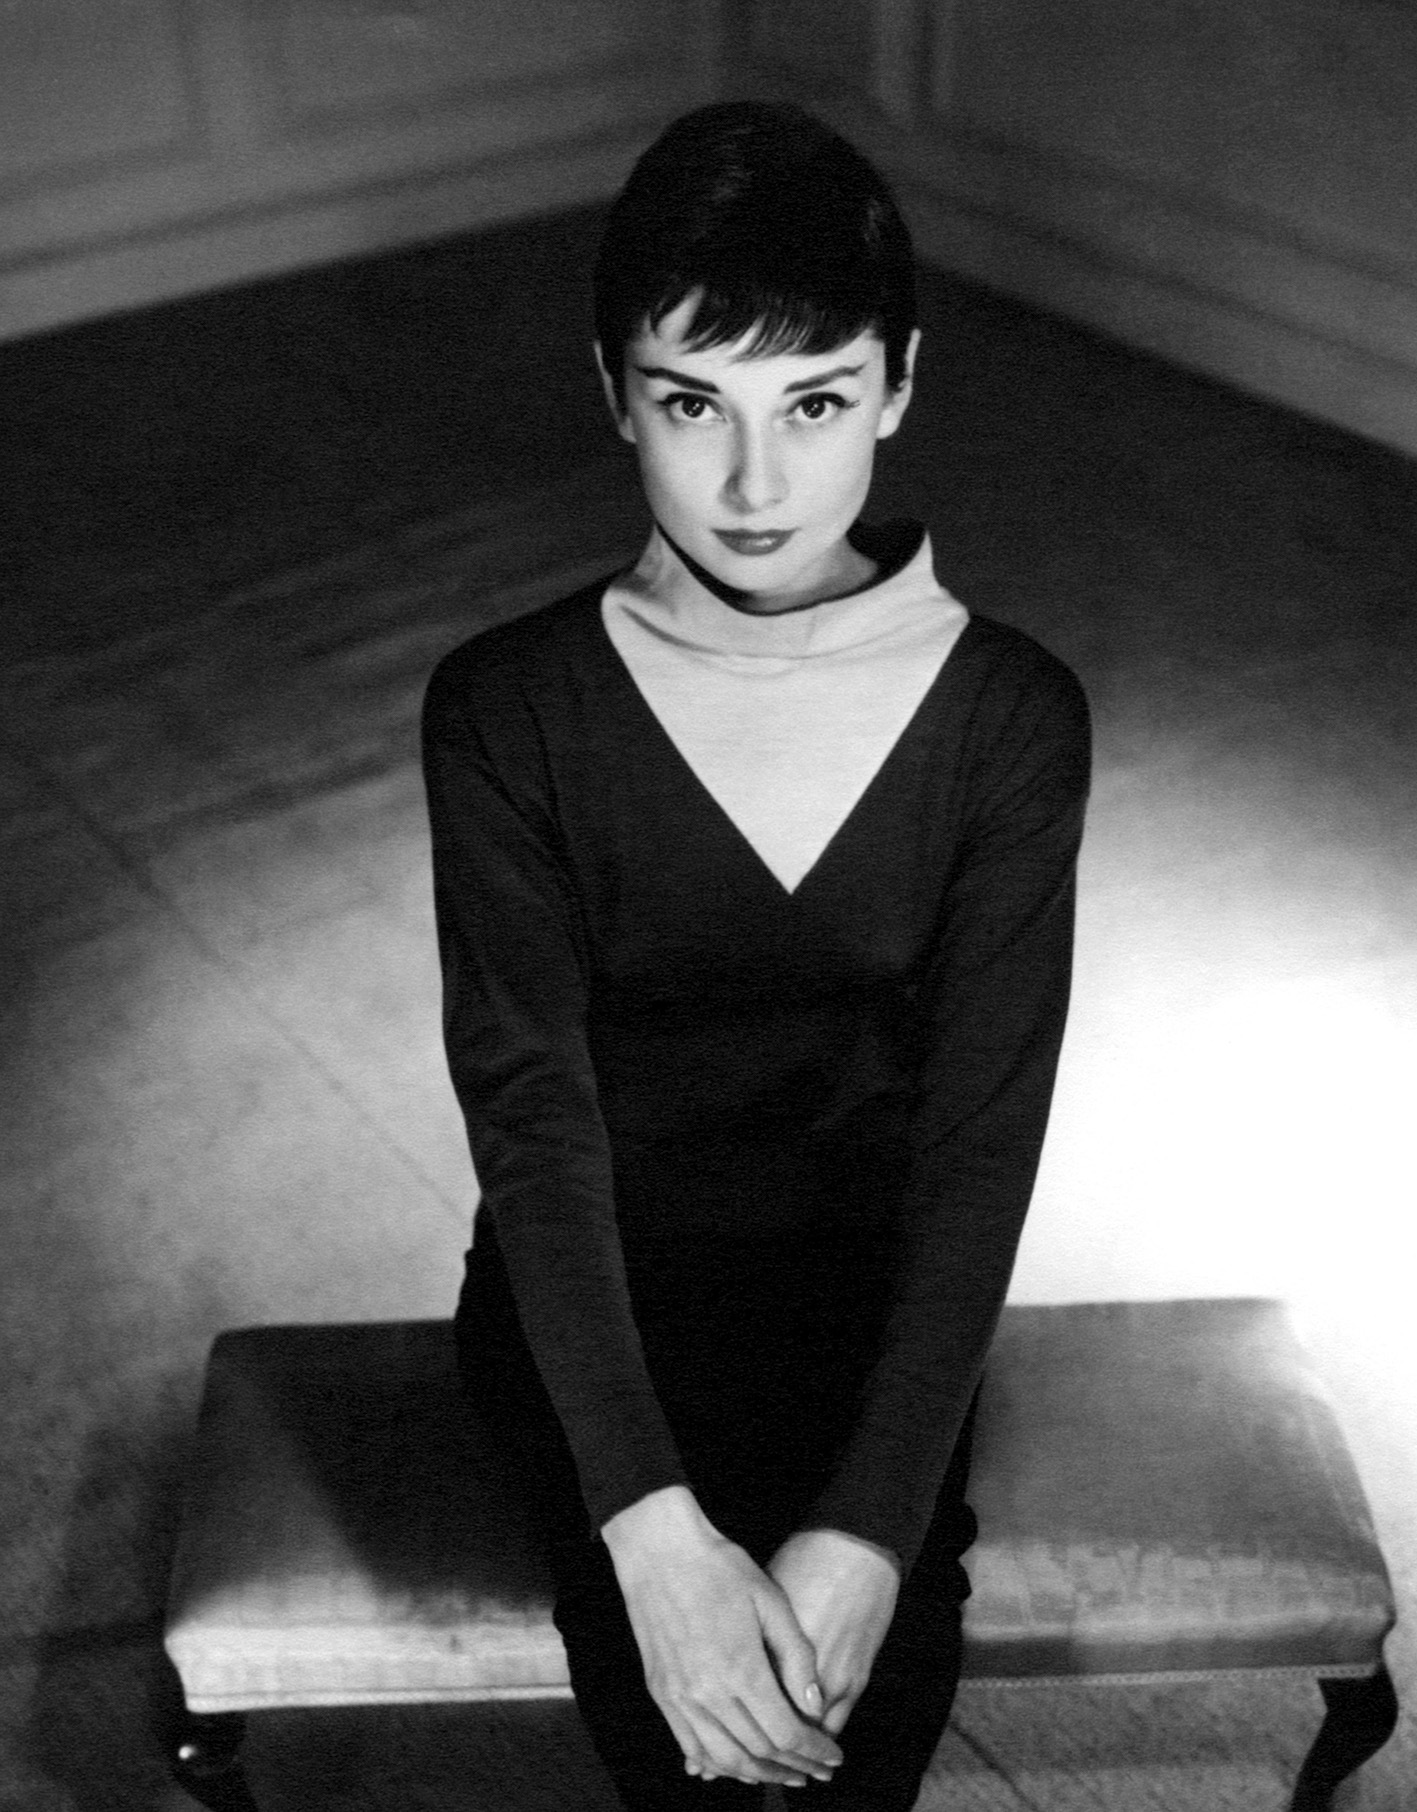 Audrey Hepburn by Antony Beauchamp, 1955 ©Reserved